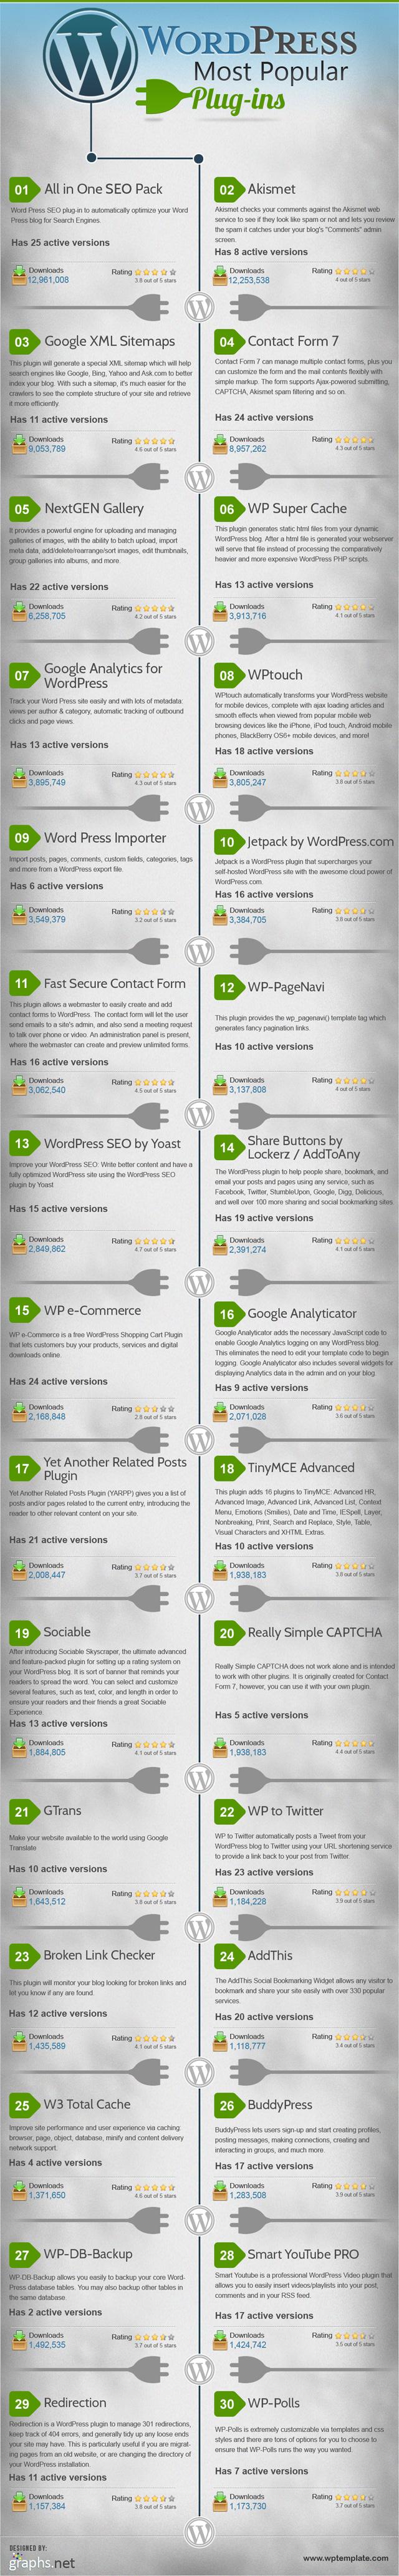 En popüler 30 WordPress eklentisi #infografik